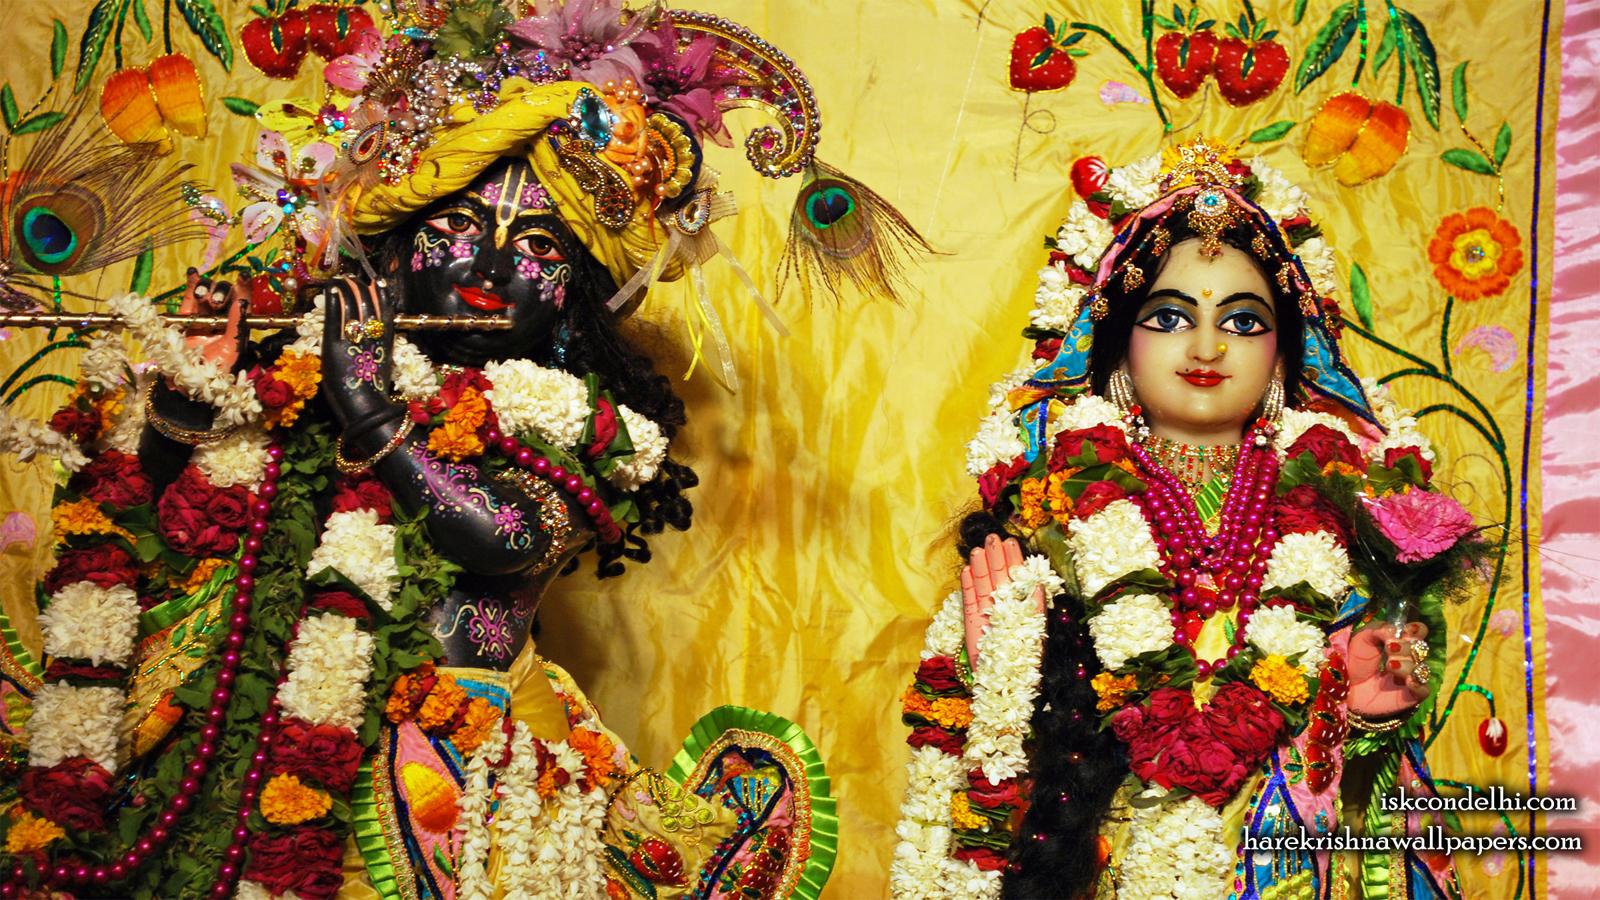 Sri Sri Radha Parthasarathi Close up Wallpaper (011) Size 1600x900 Download